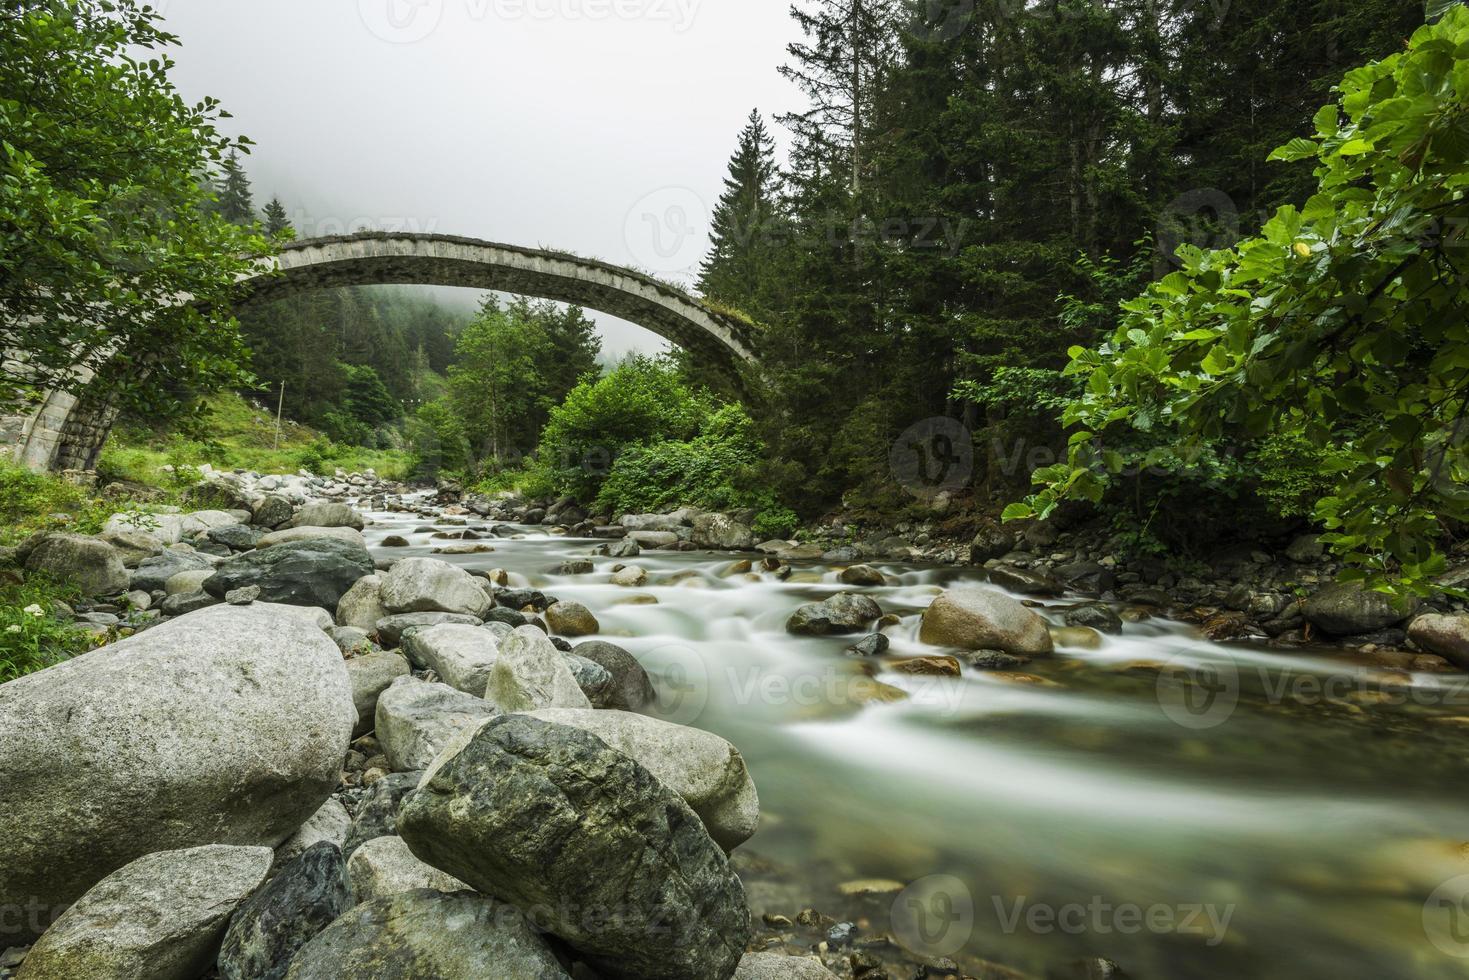 ponte di pietra, rize, turchia foto